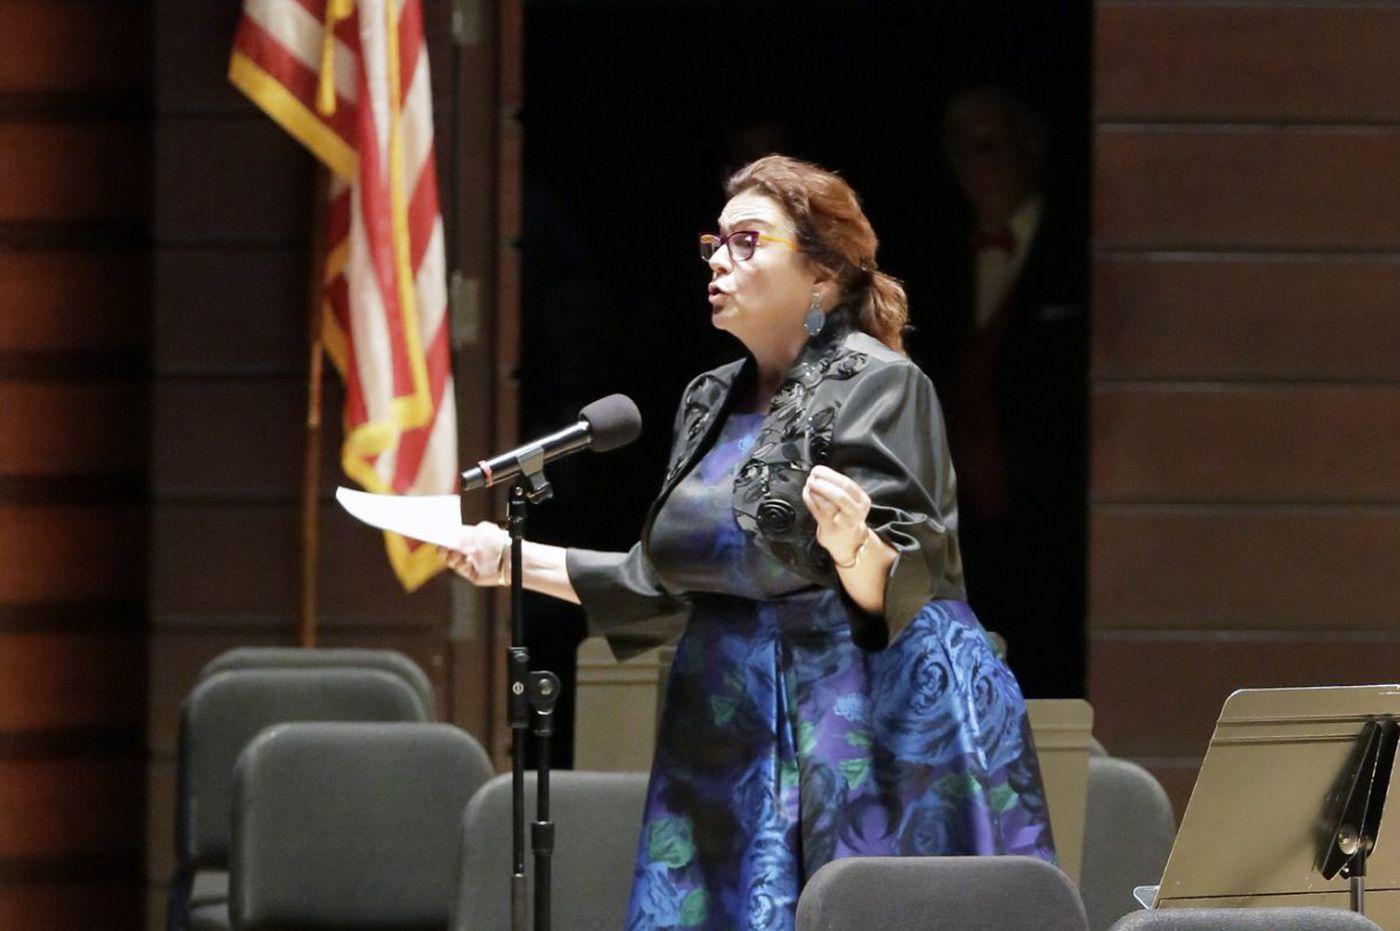 Philadelphia Orchestra chief to step down